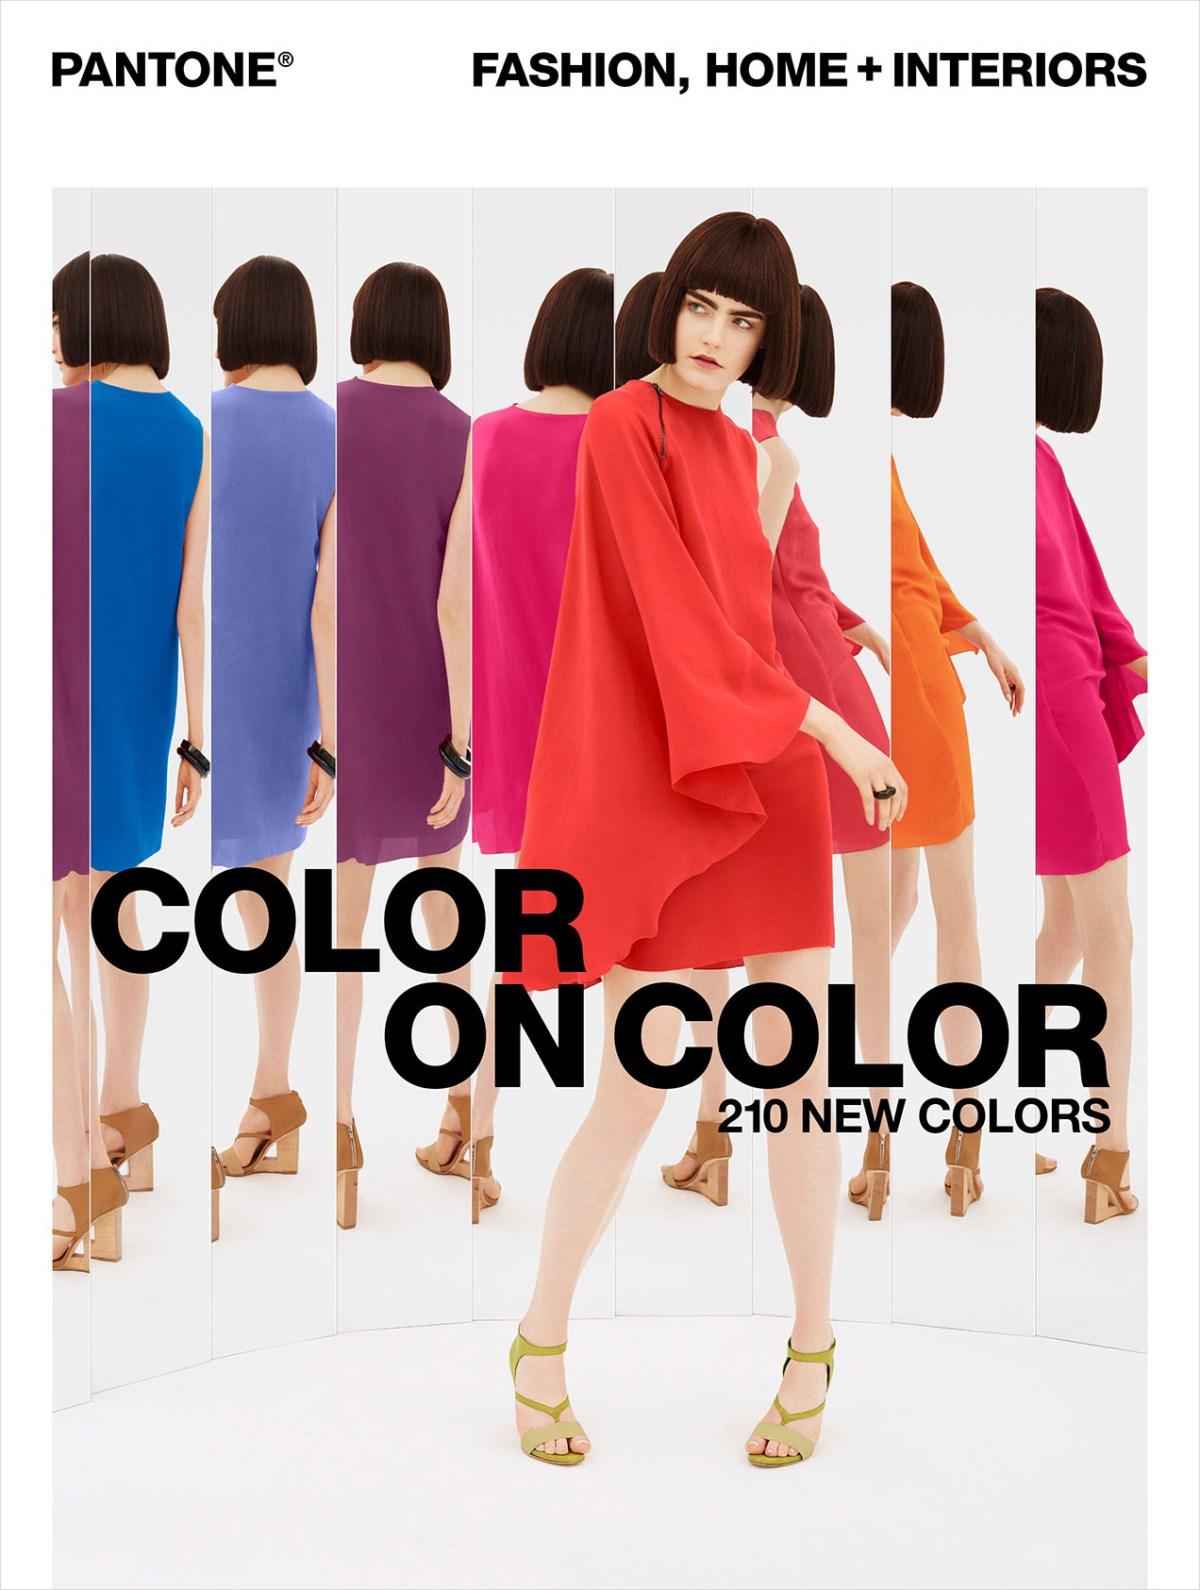 Base Pantone - Color on Color - Ad 02